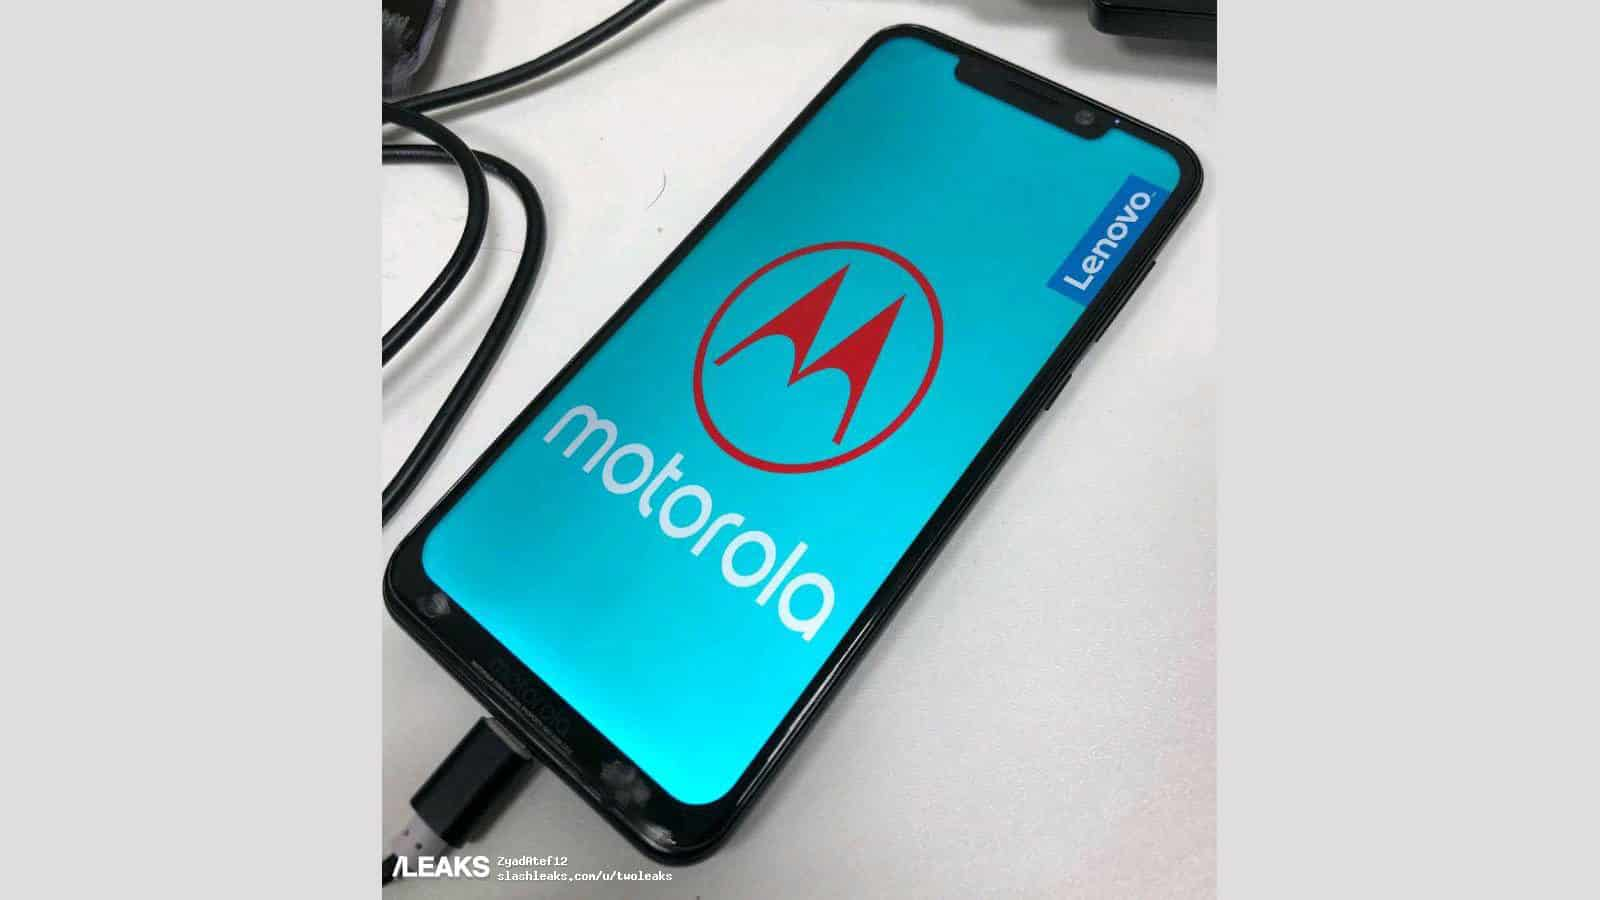 Alleged Motorola One Power Prototype Leaks With Screen